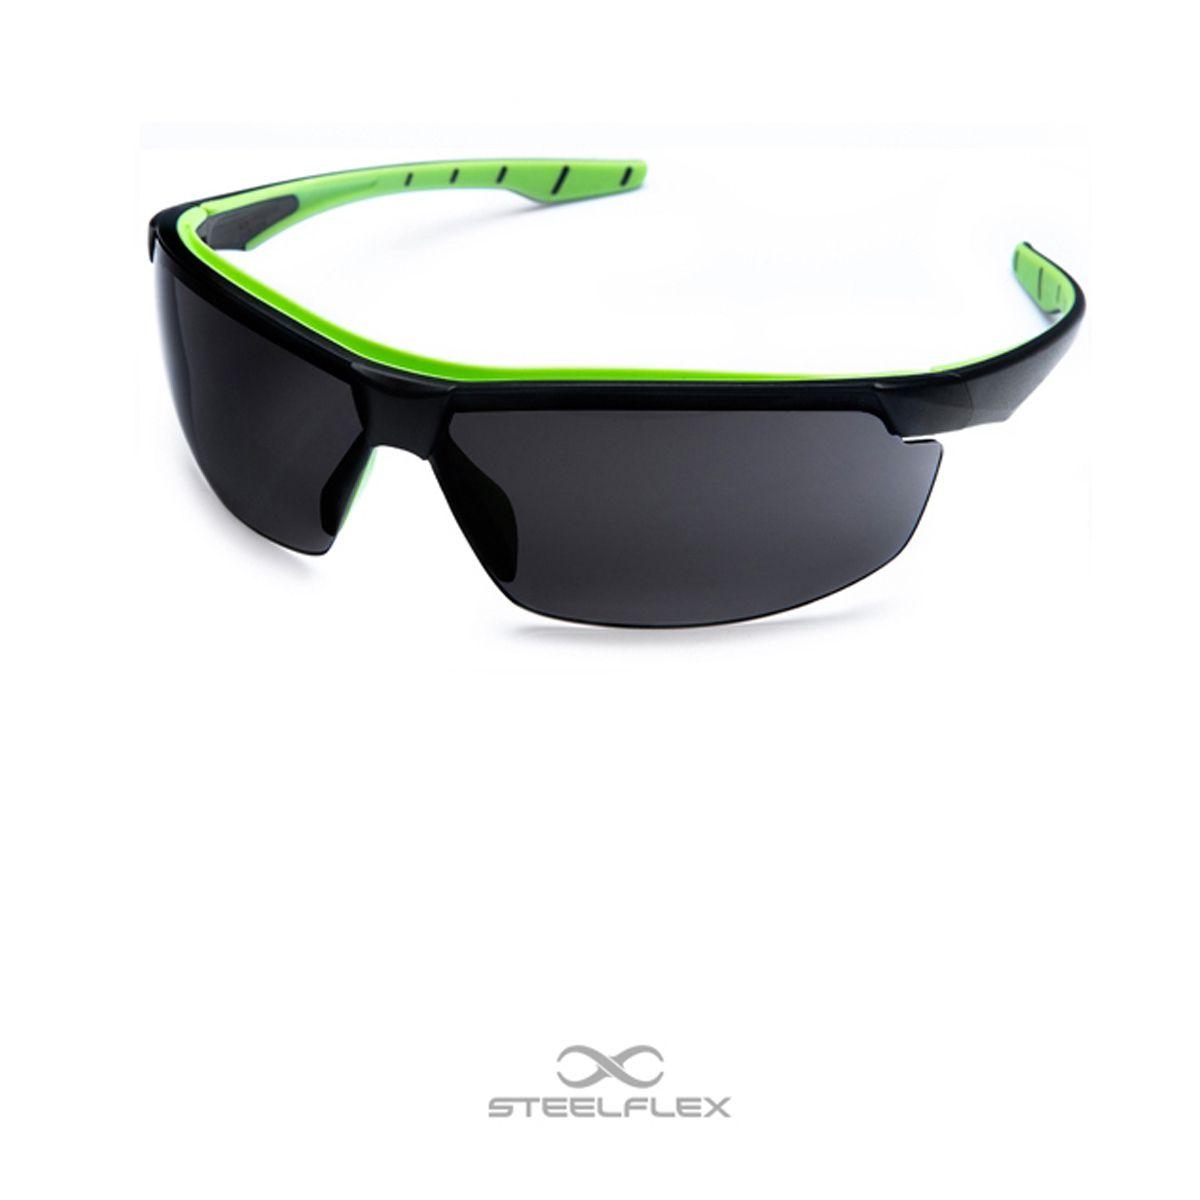 Óculos de Segurança Steelflex NEON Verde – Lente Cinza/Fumê